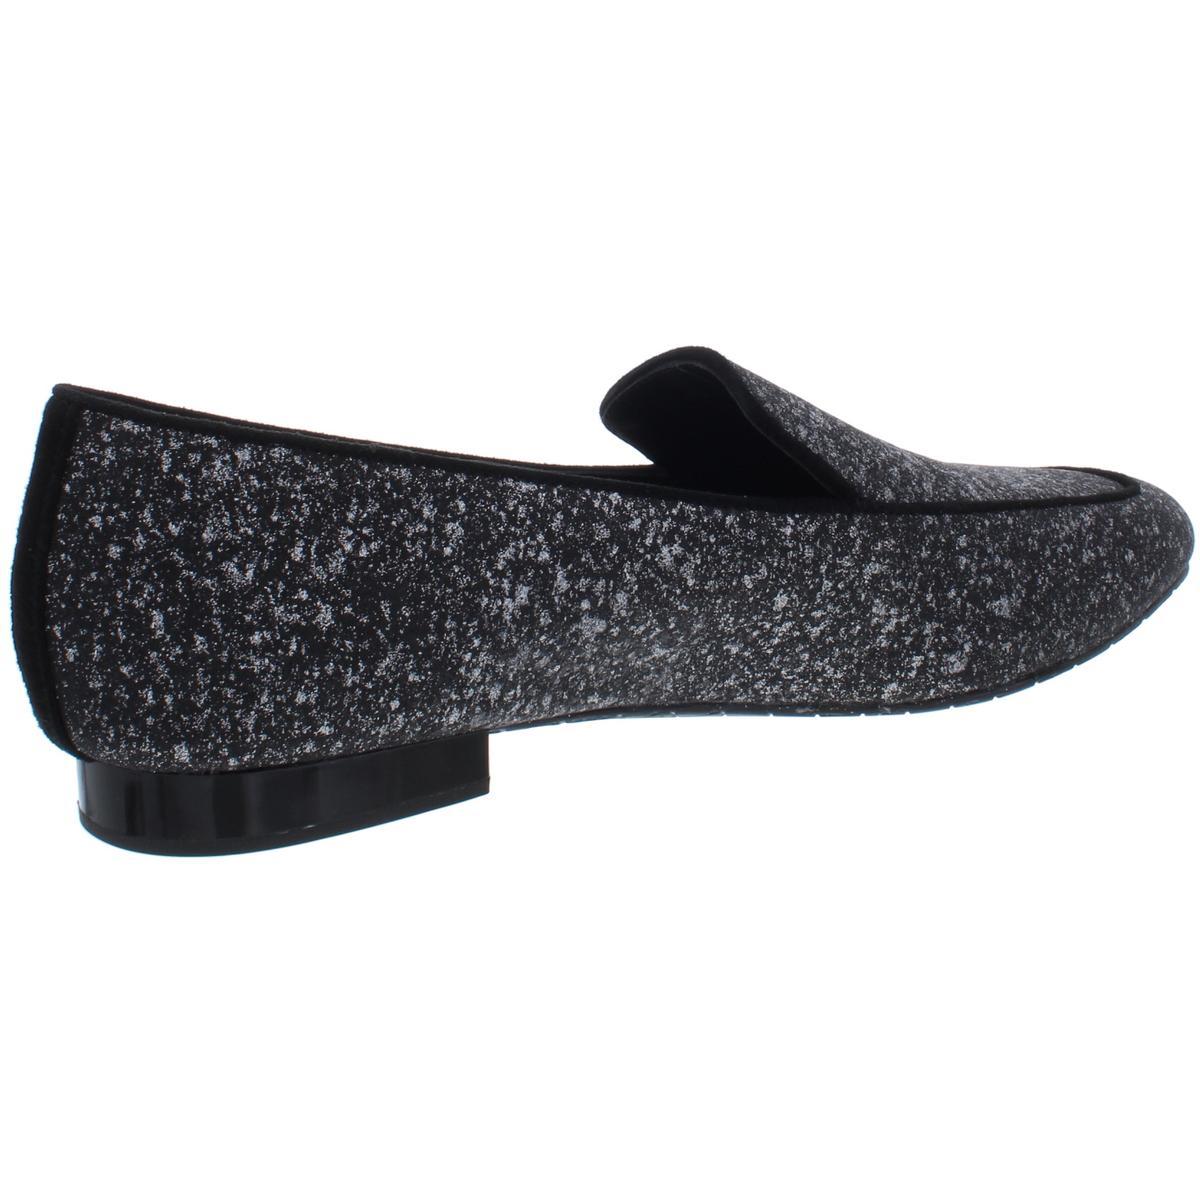 Donald-J-Pliner-Womens-Honey-Slip-On-Loafers-Shoes-BHFO-7808 thumbnail 4